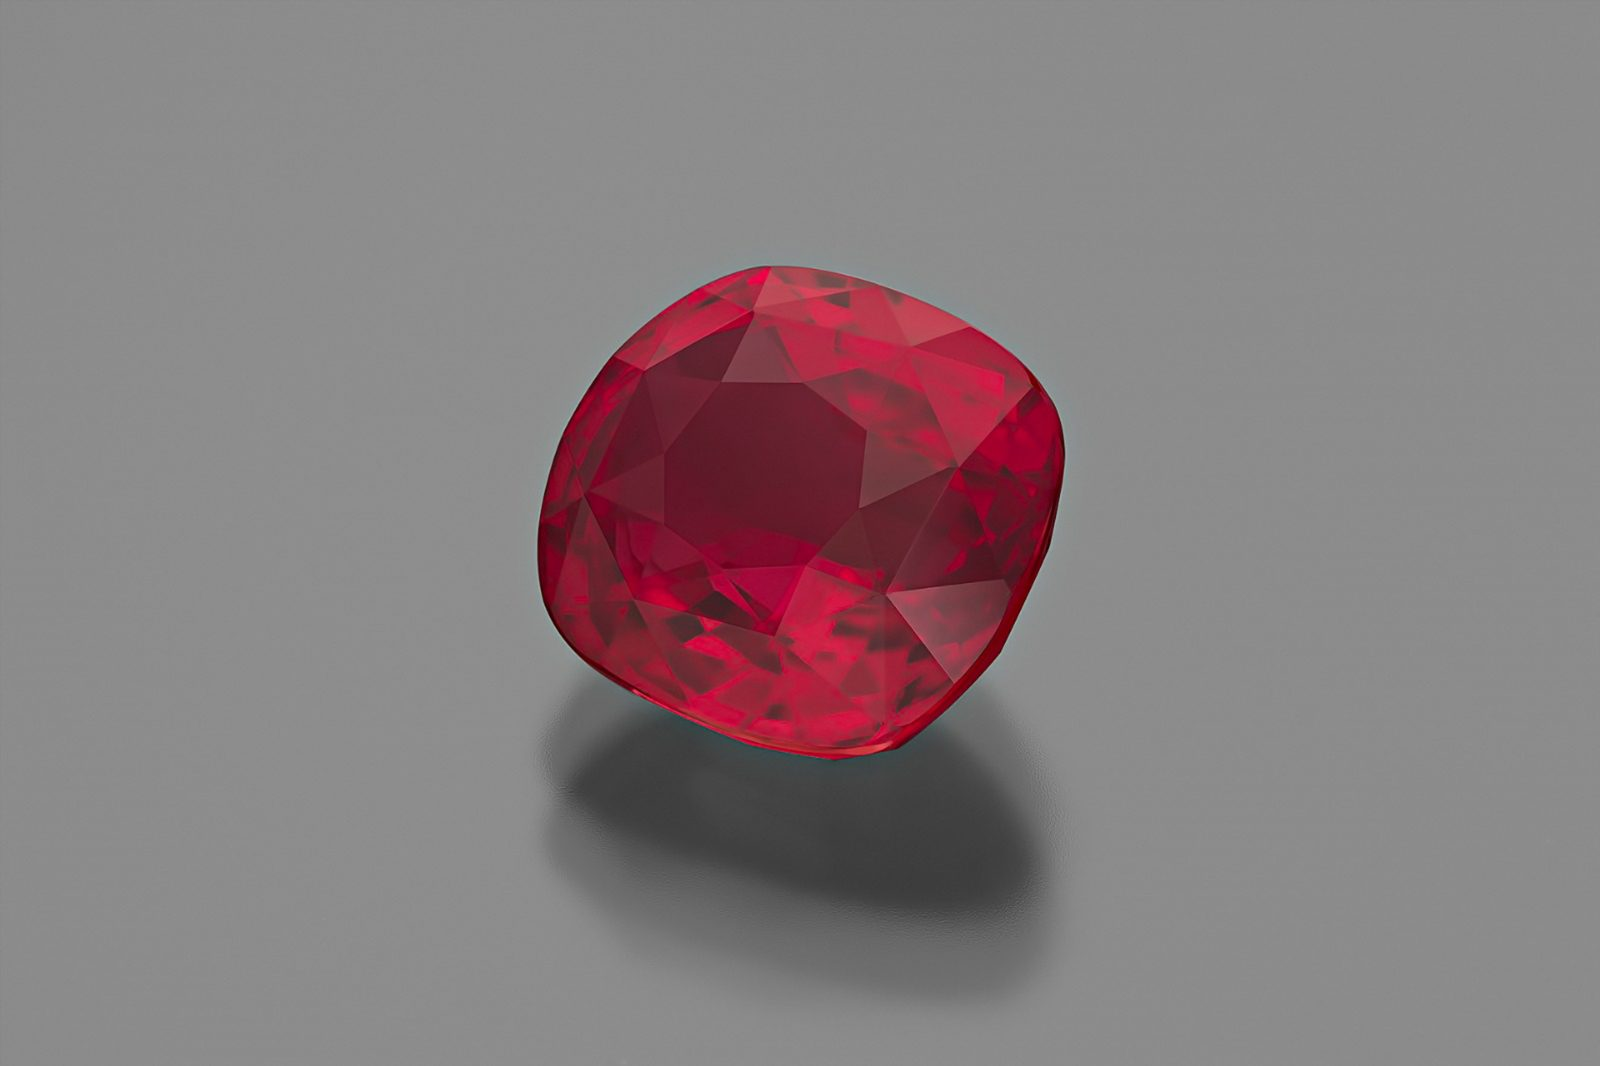 Sant Enterprises Introduces the 'Rose of Mozambique' Gemfields Ruby